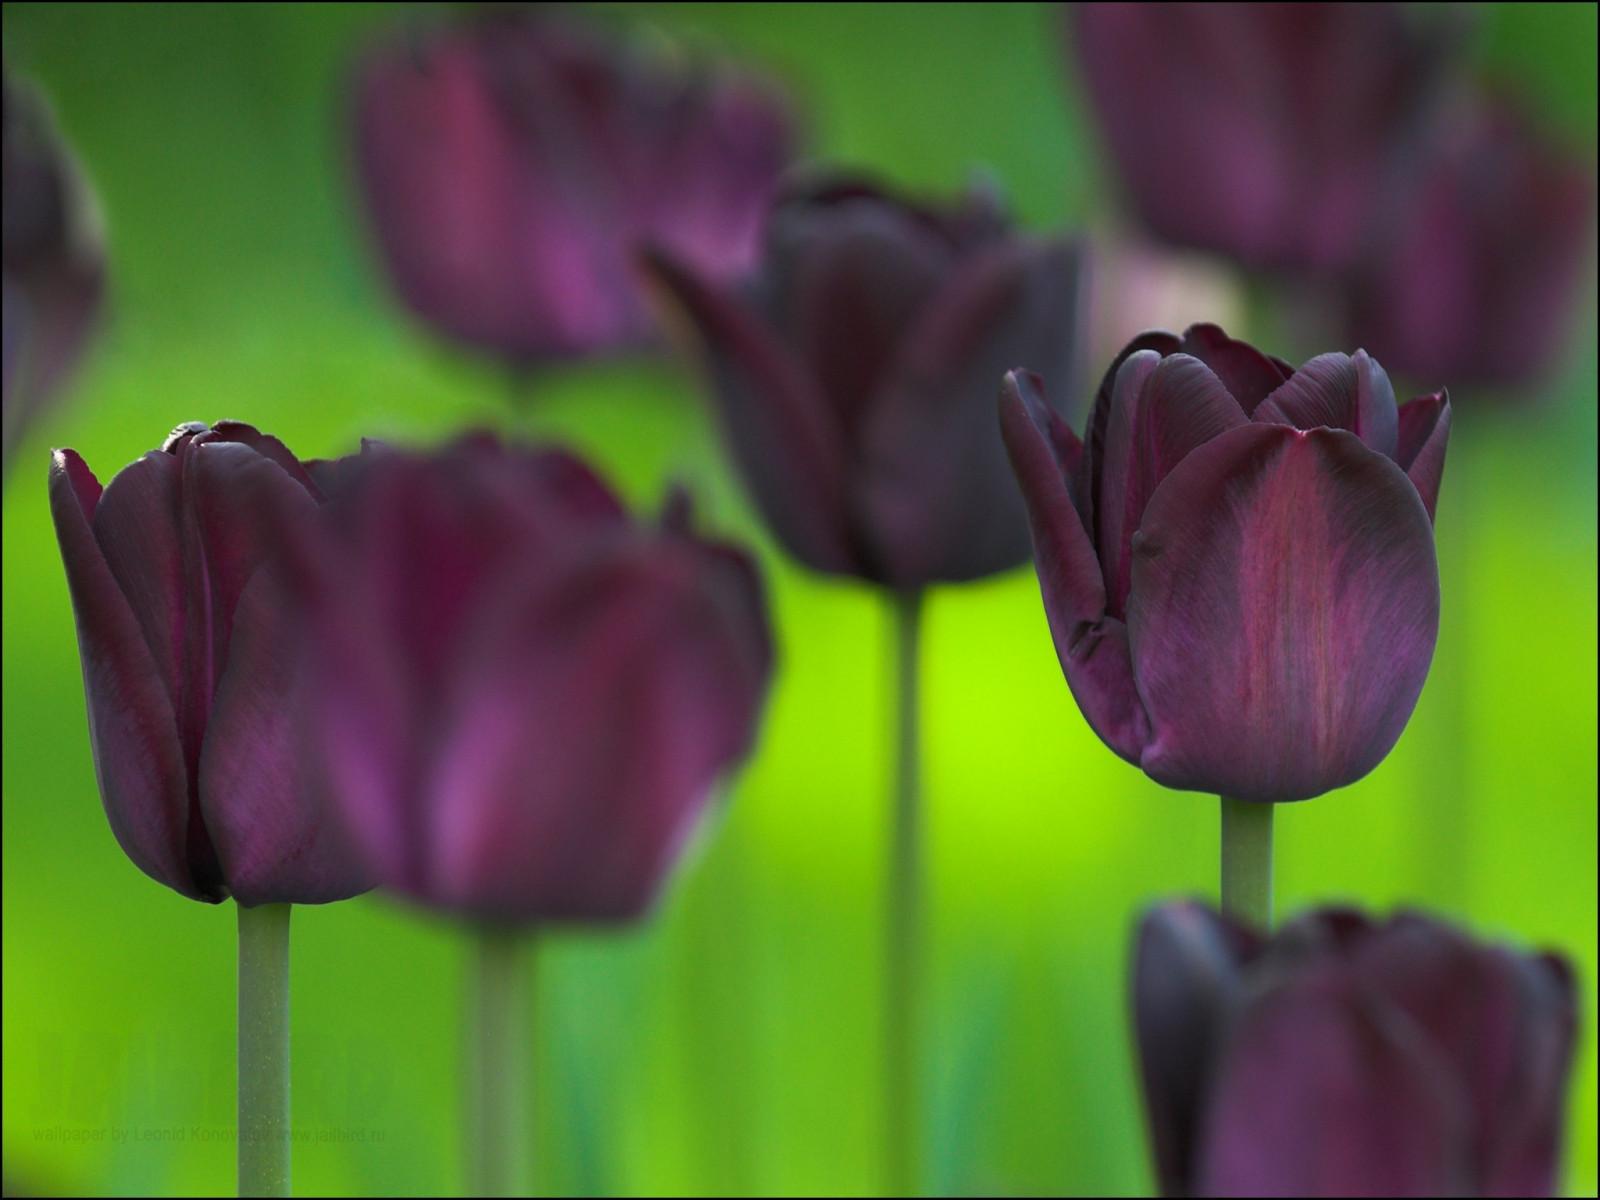 Картинки шайнинг, открытки черные тюльпаны